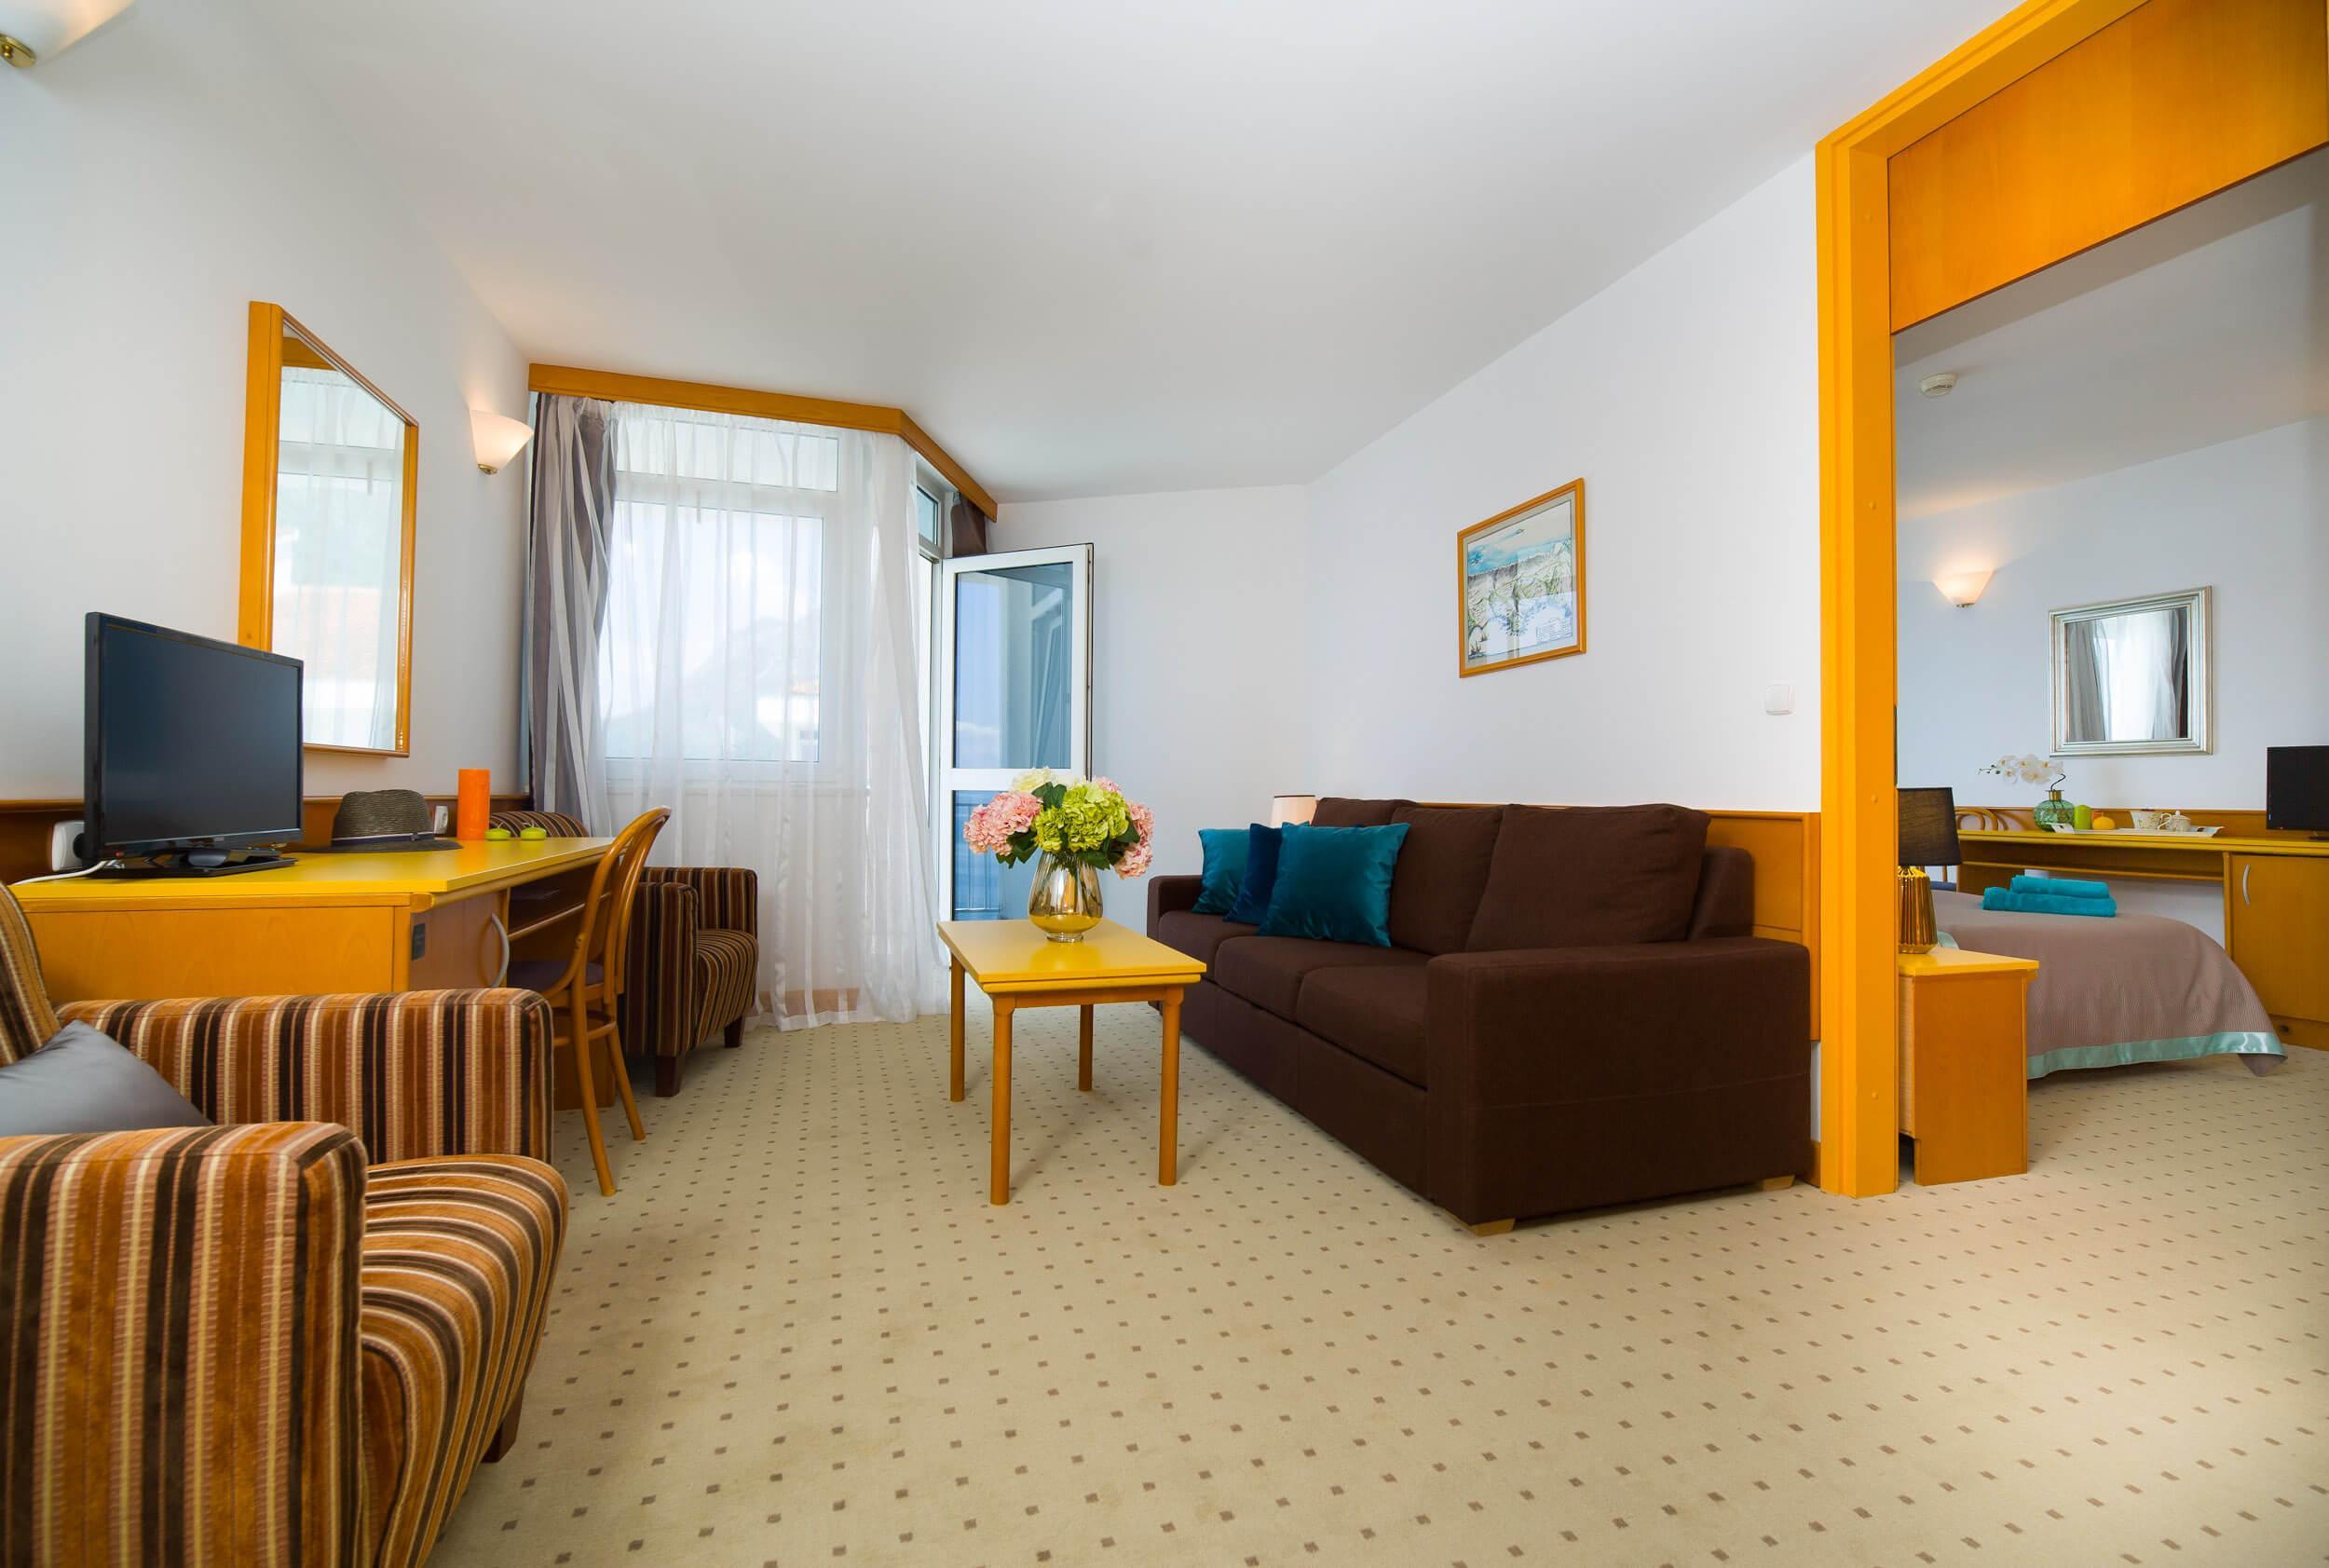 44_Comfort family room